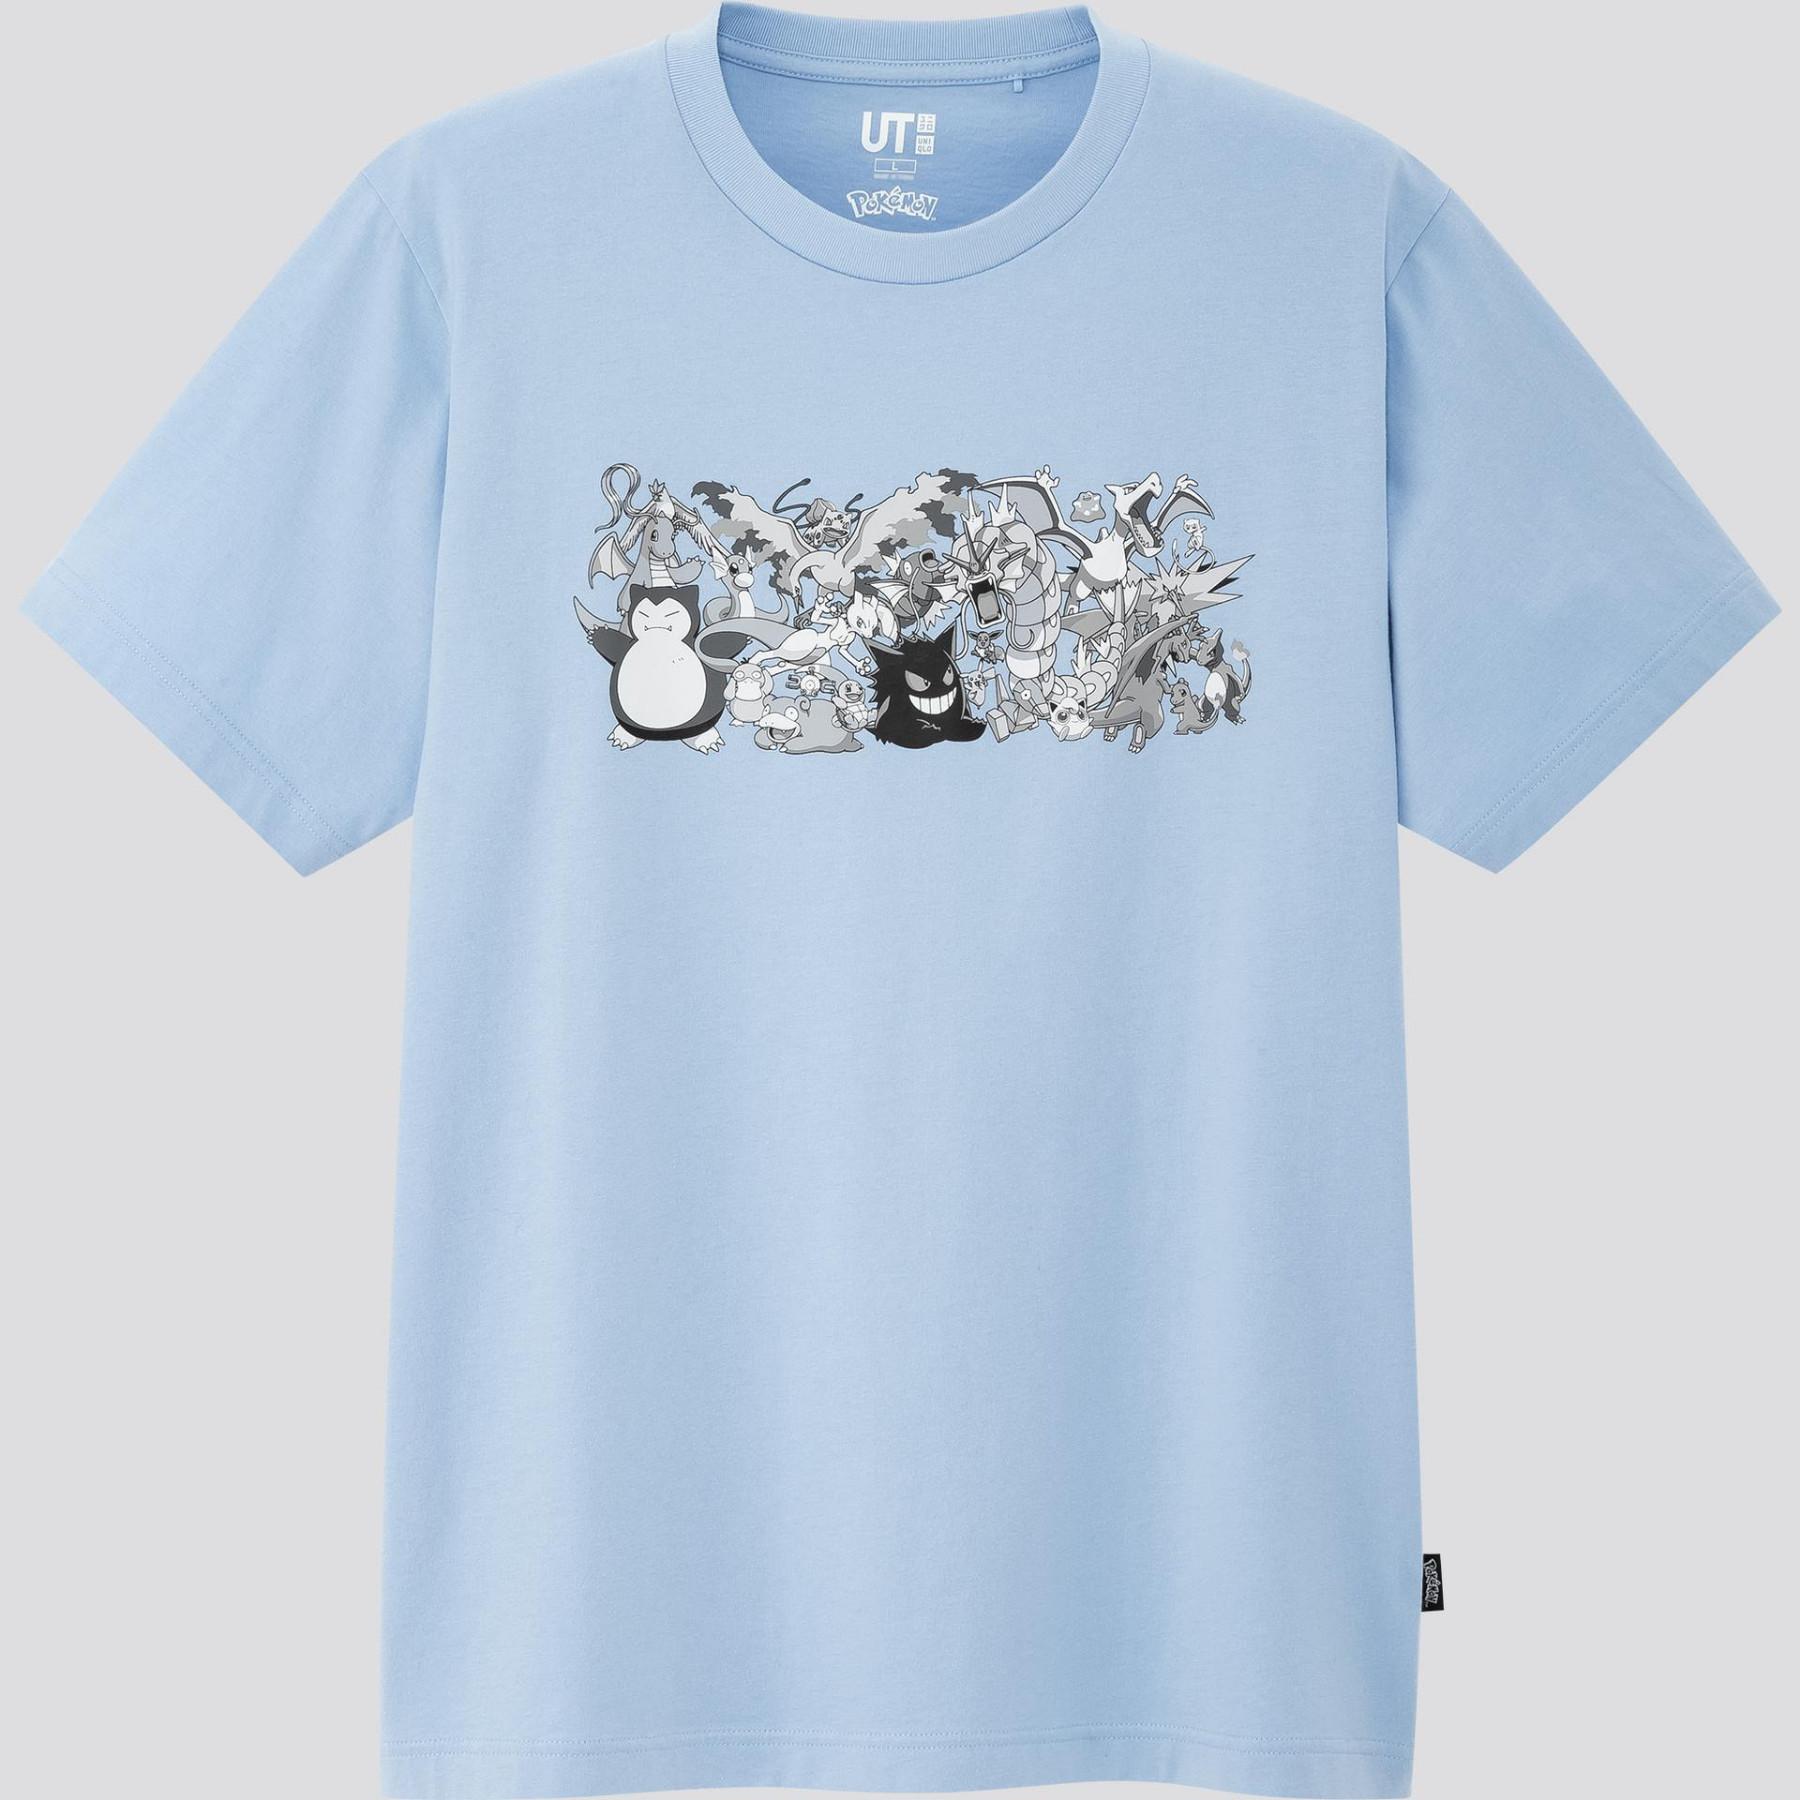 Pokémon x UNIQLO Light Blue T-Shirt